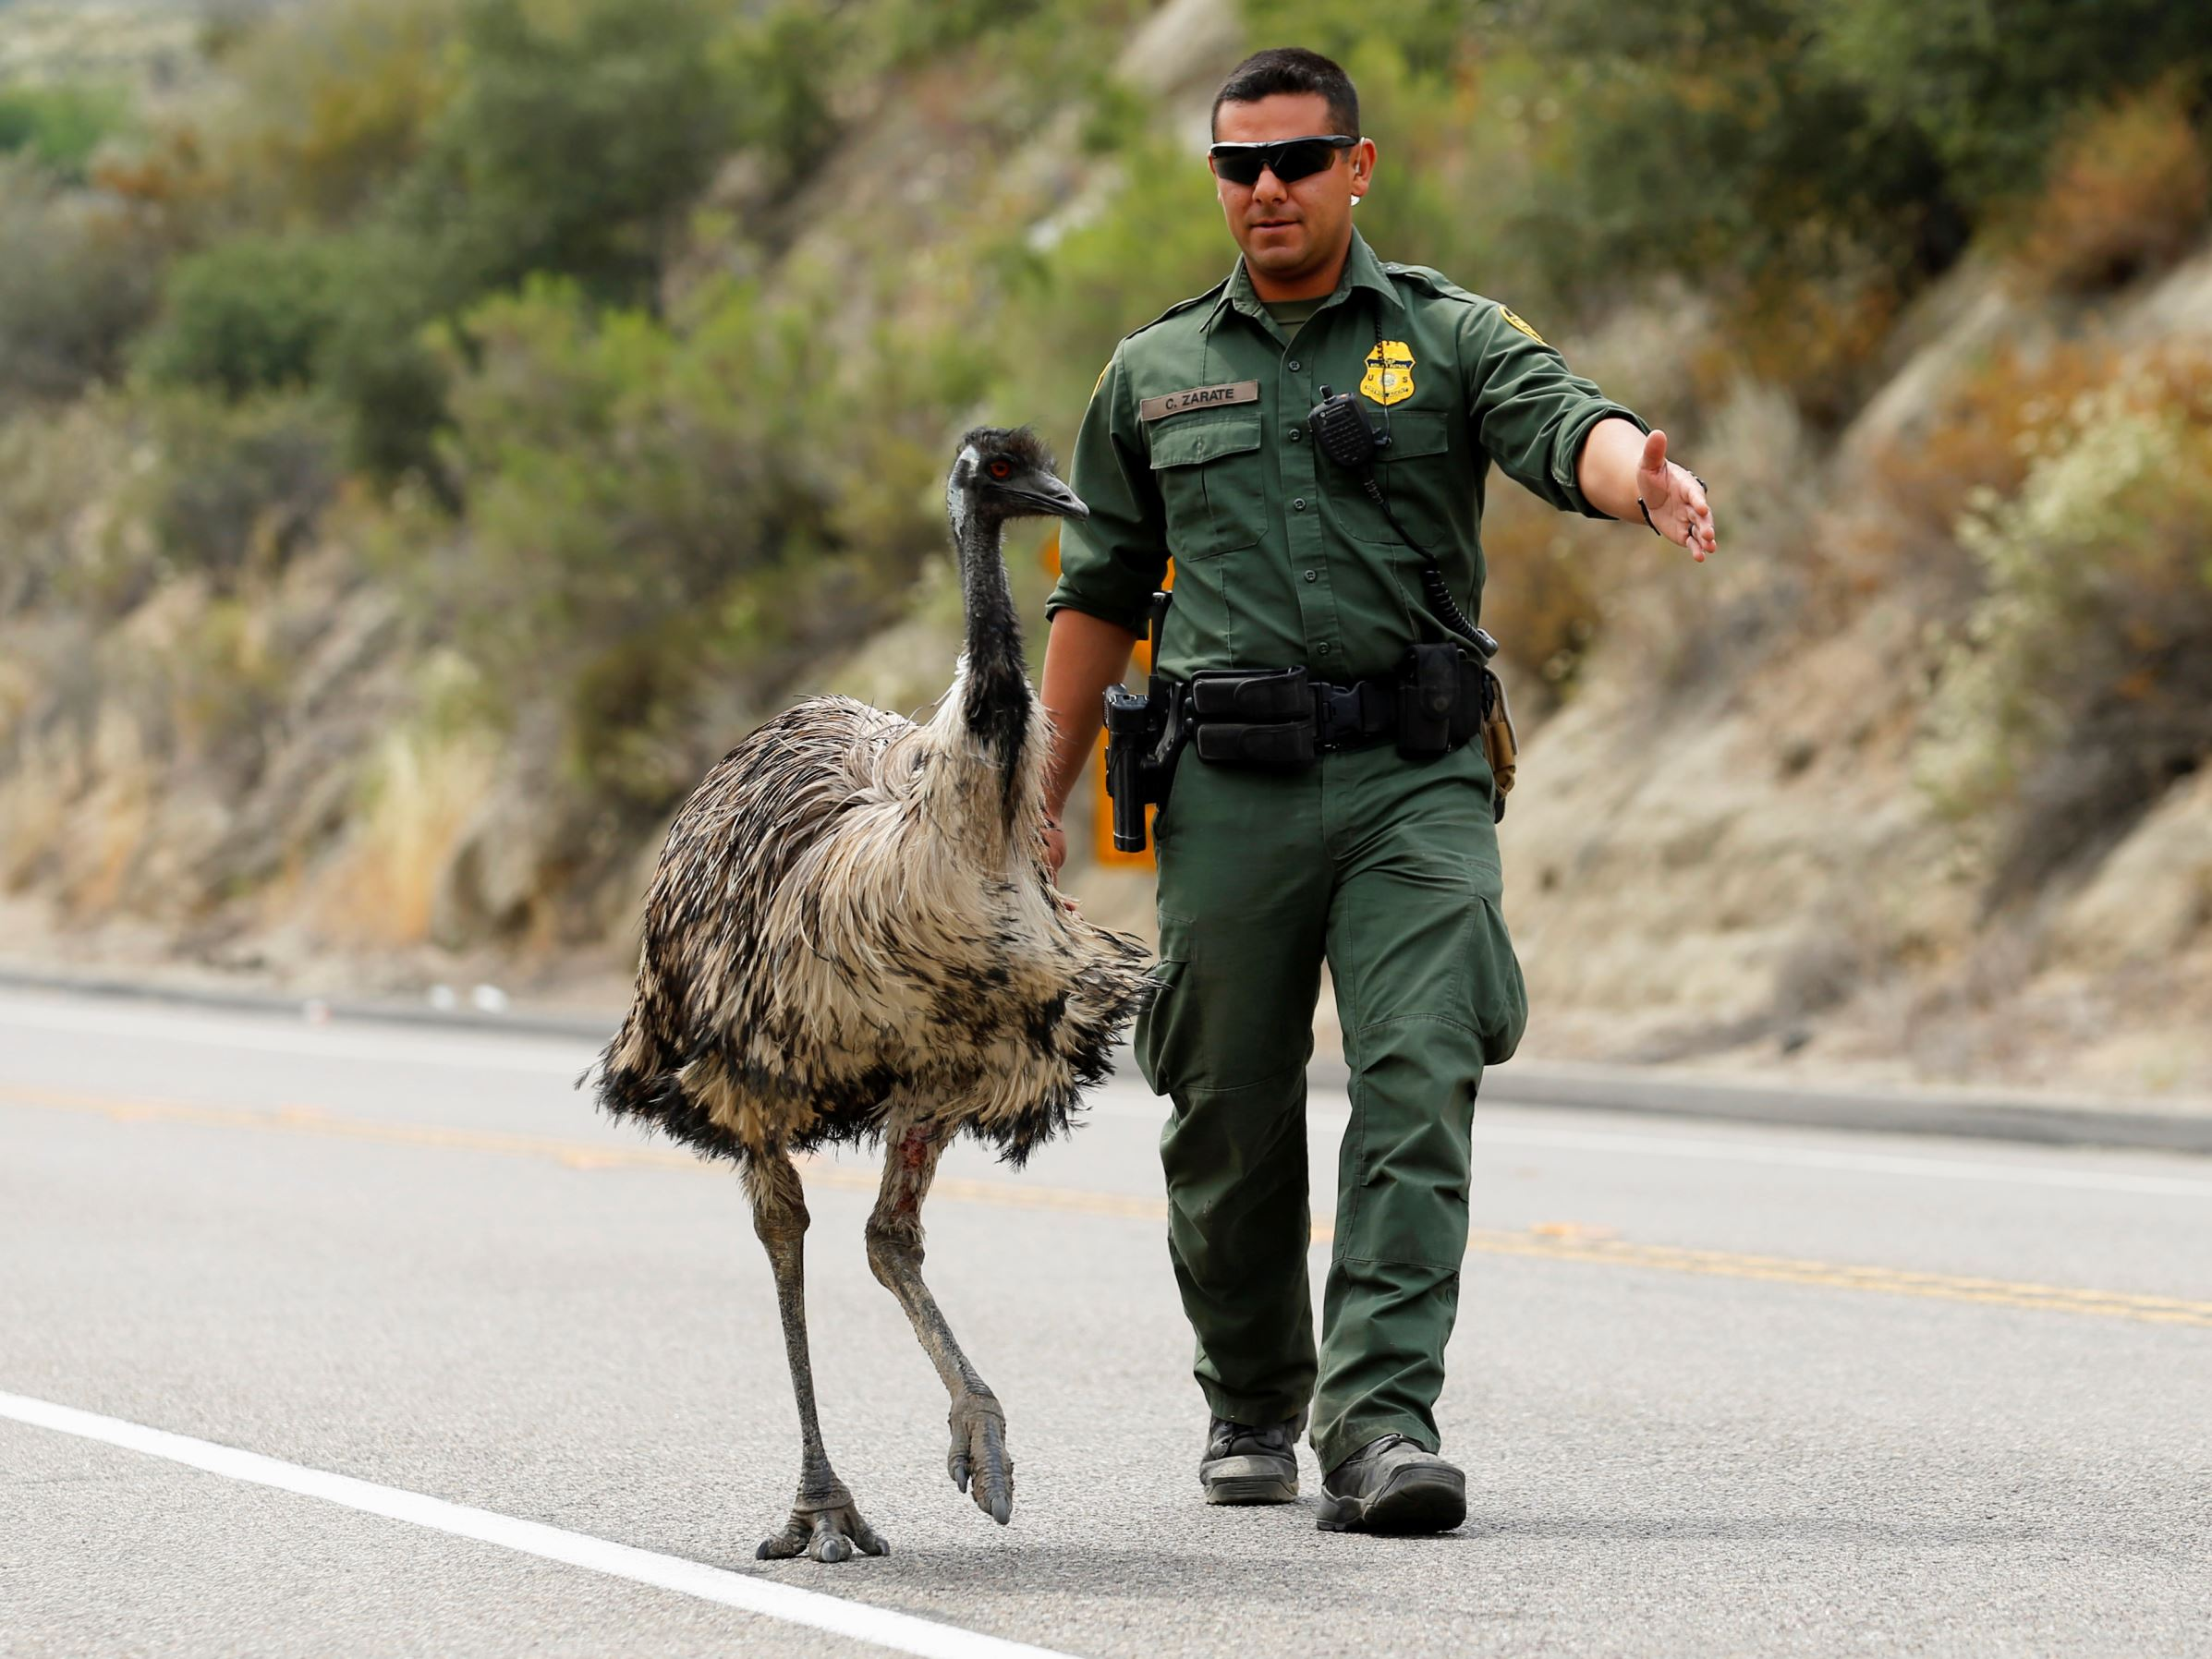 Слайд 31 из 67: U.S. Customs and Border Patrol officer Constantino Zarate tries to heard an Emu off the highway as a wildfire continues to burn north of the U.S. Mexico border near Potrero, California, U.S. June 21, 2016.